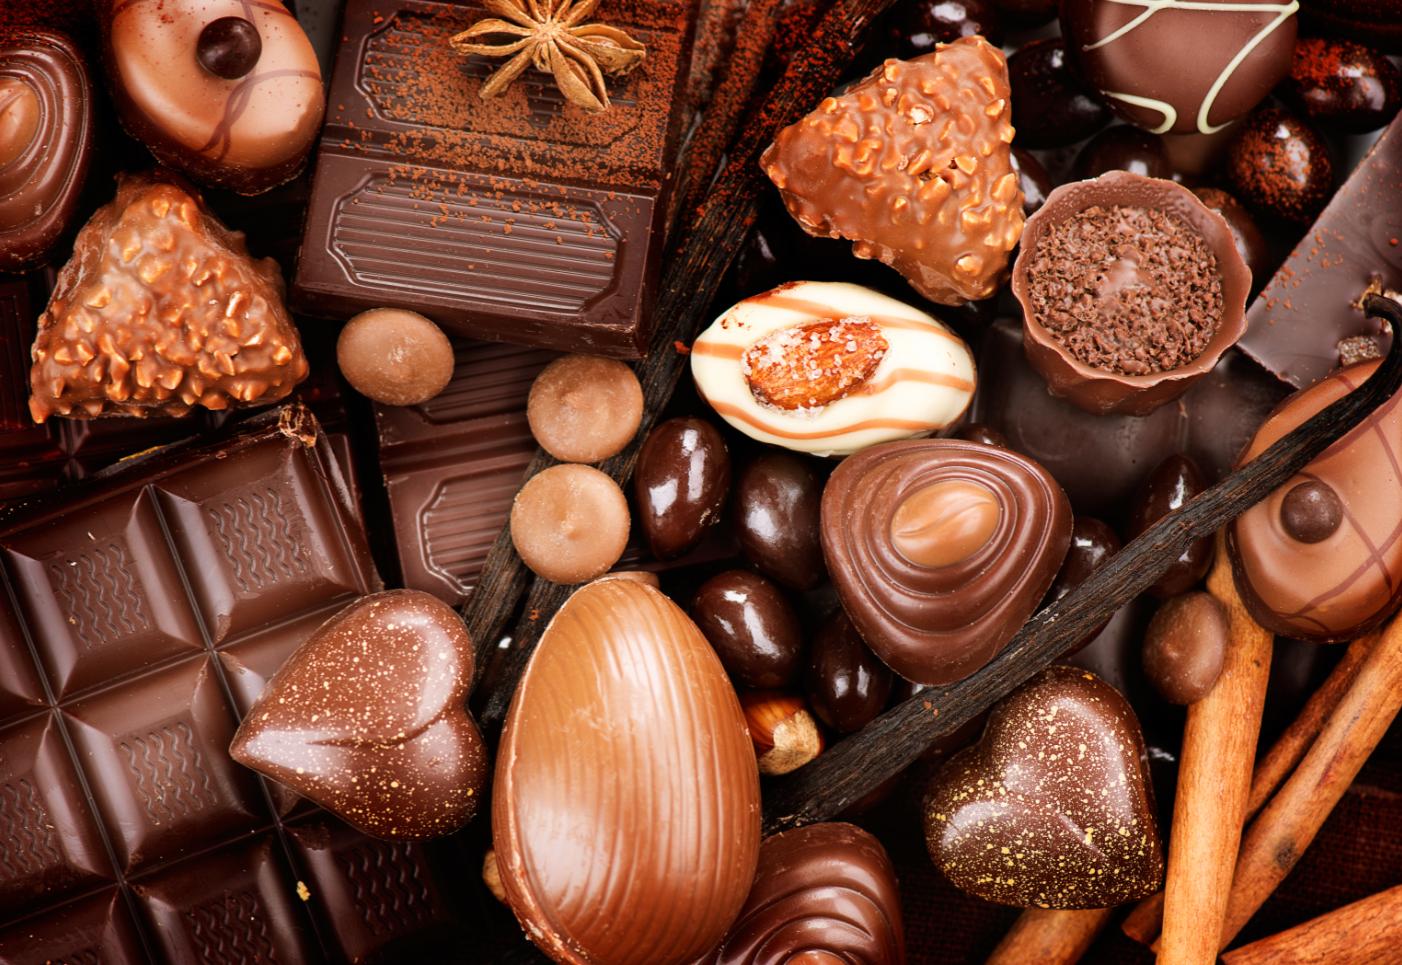 20180105000745.png - バレンタインにおすすめ!チョコと一緒に渡したい贈り物まとめ